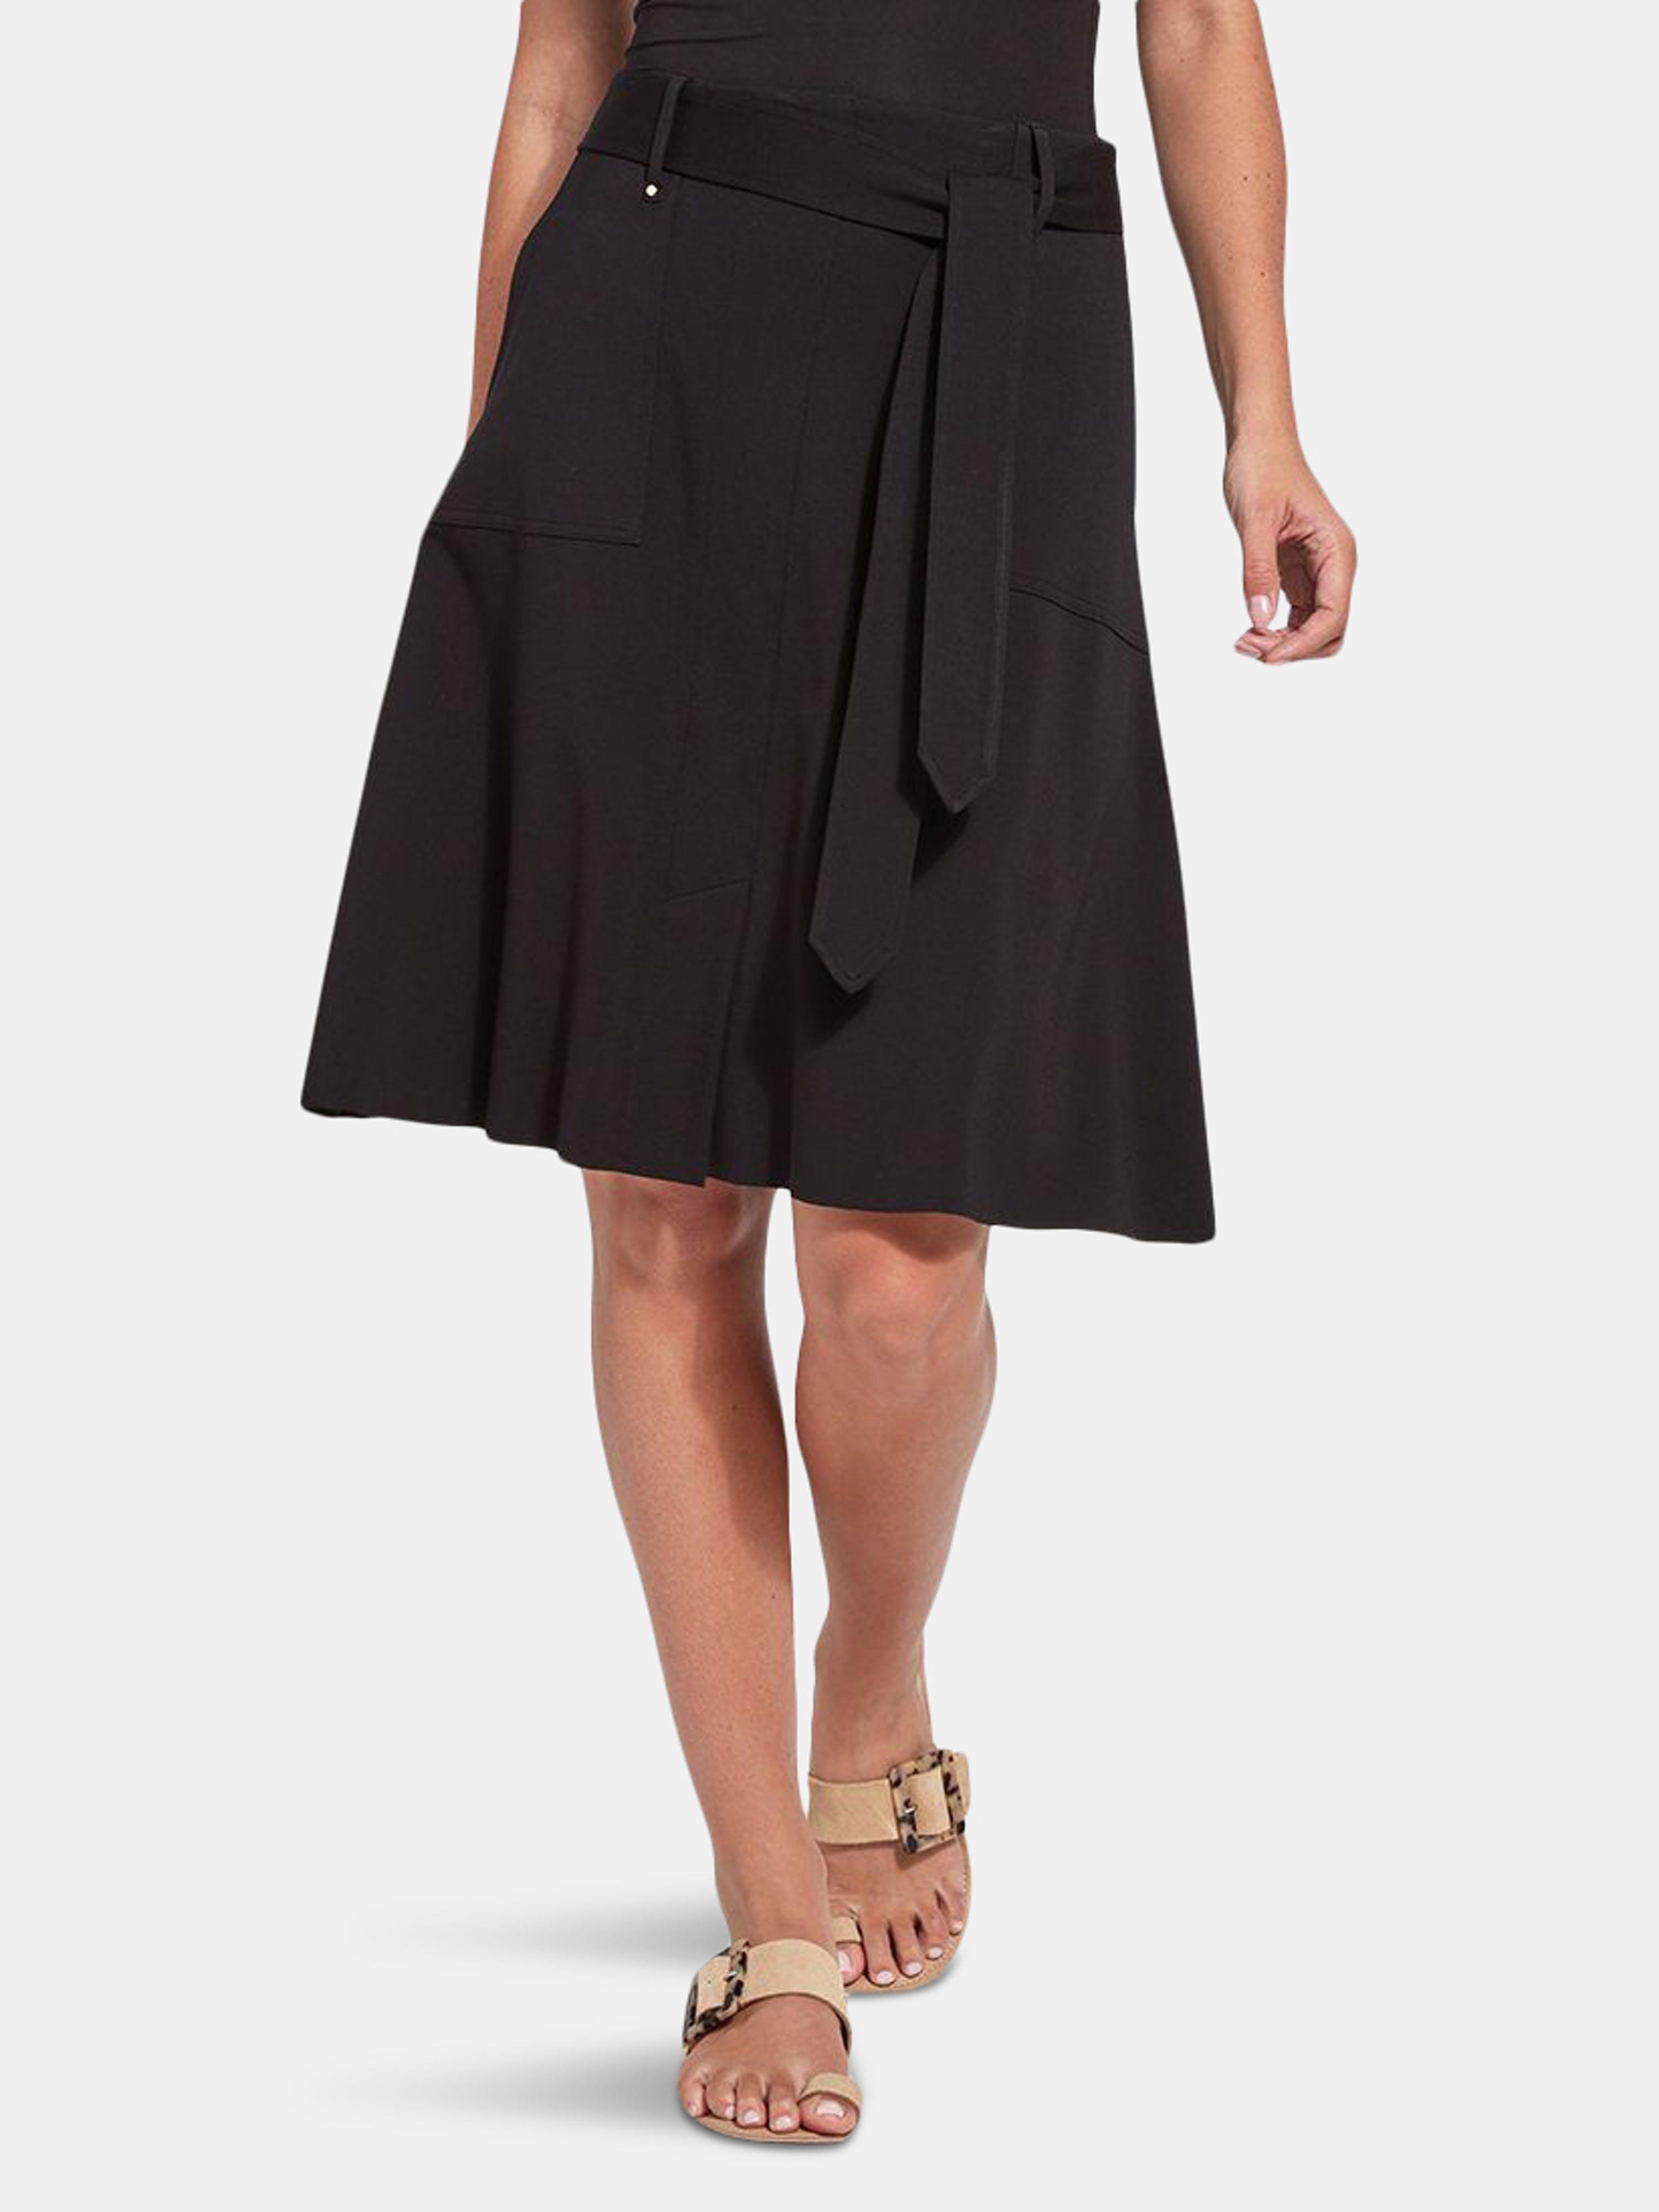 Lyssé Skirts LYSSE SAMARA SKIRT